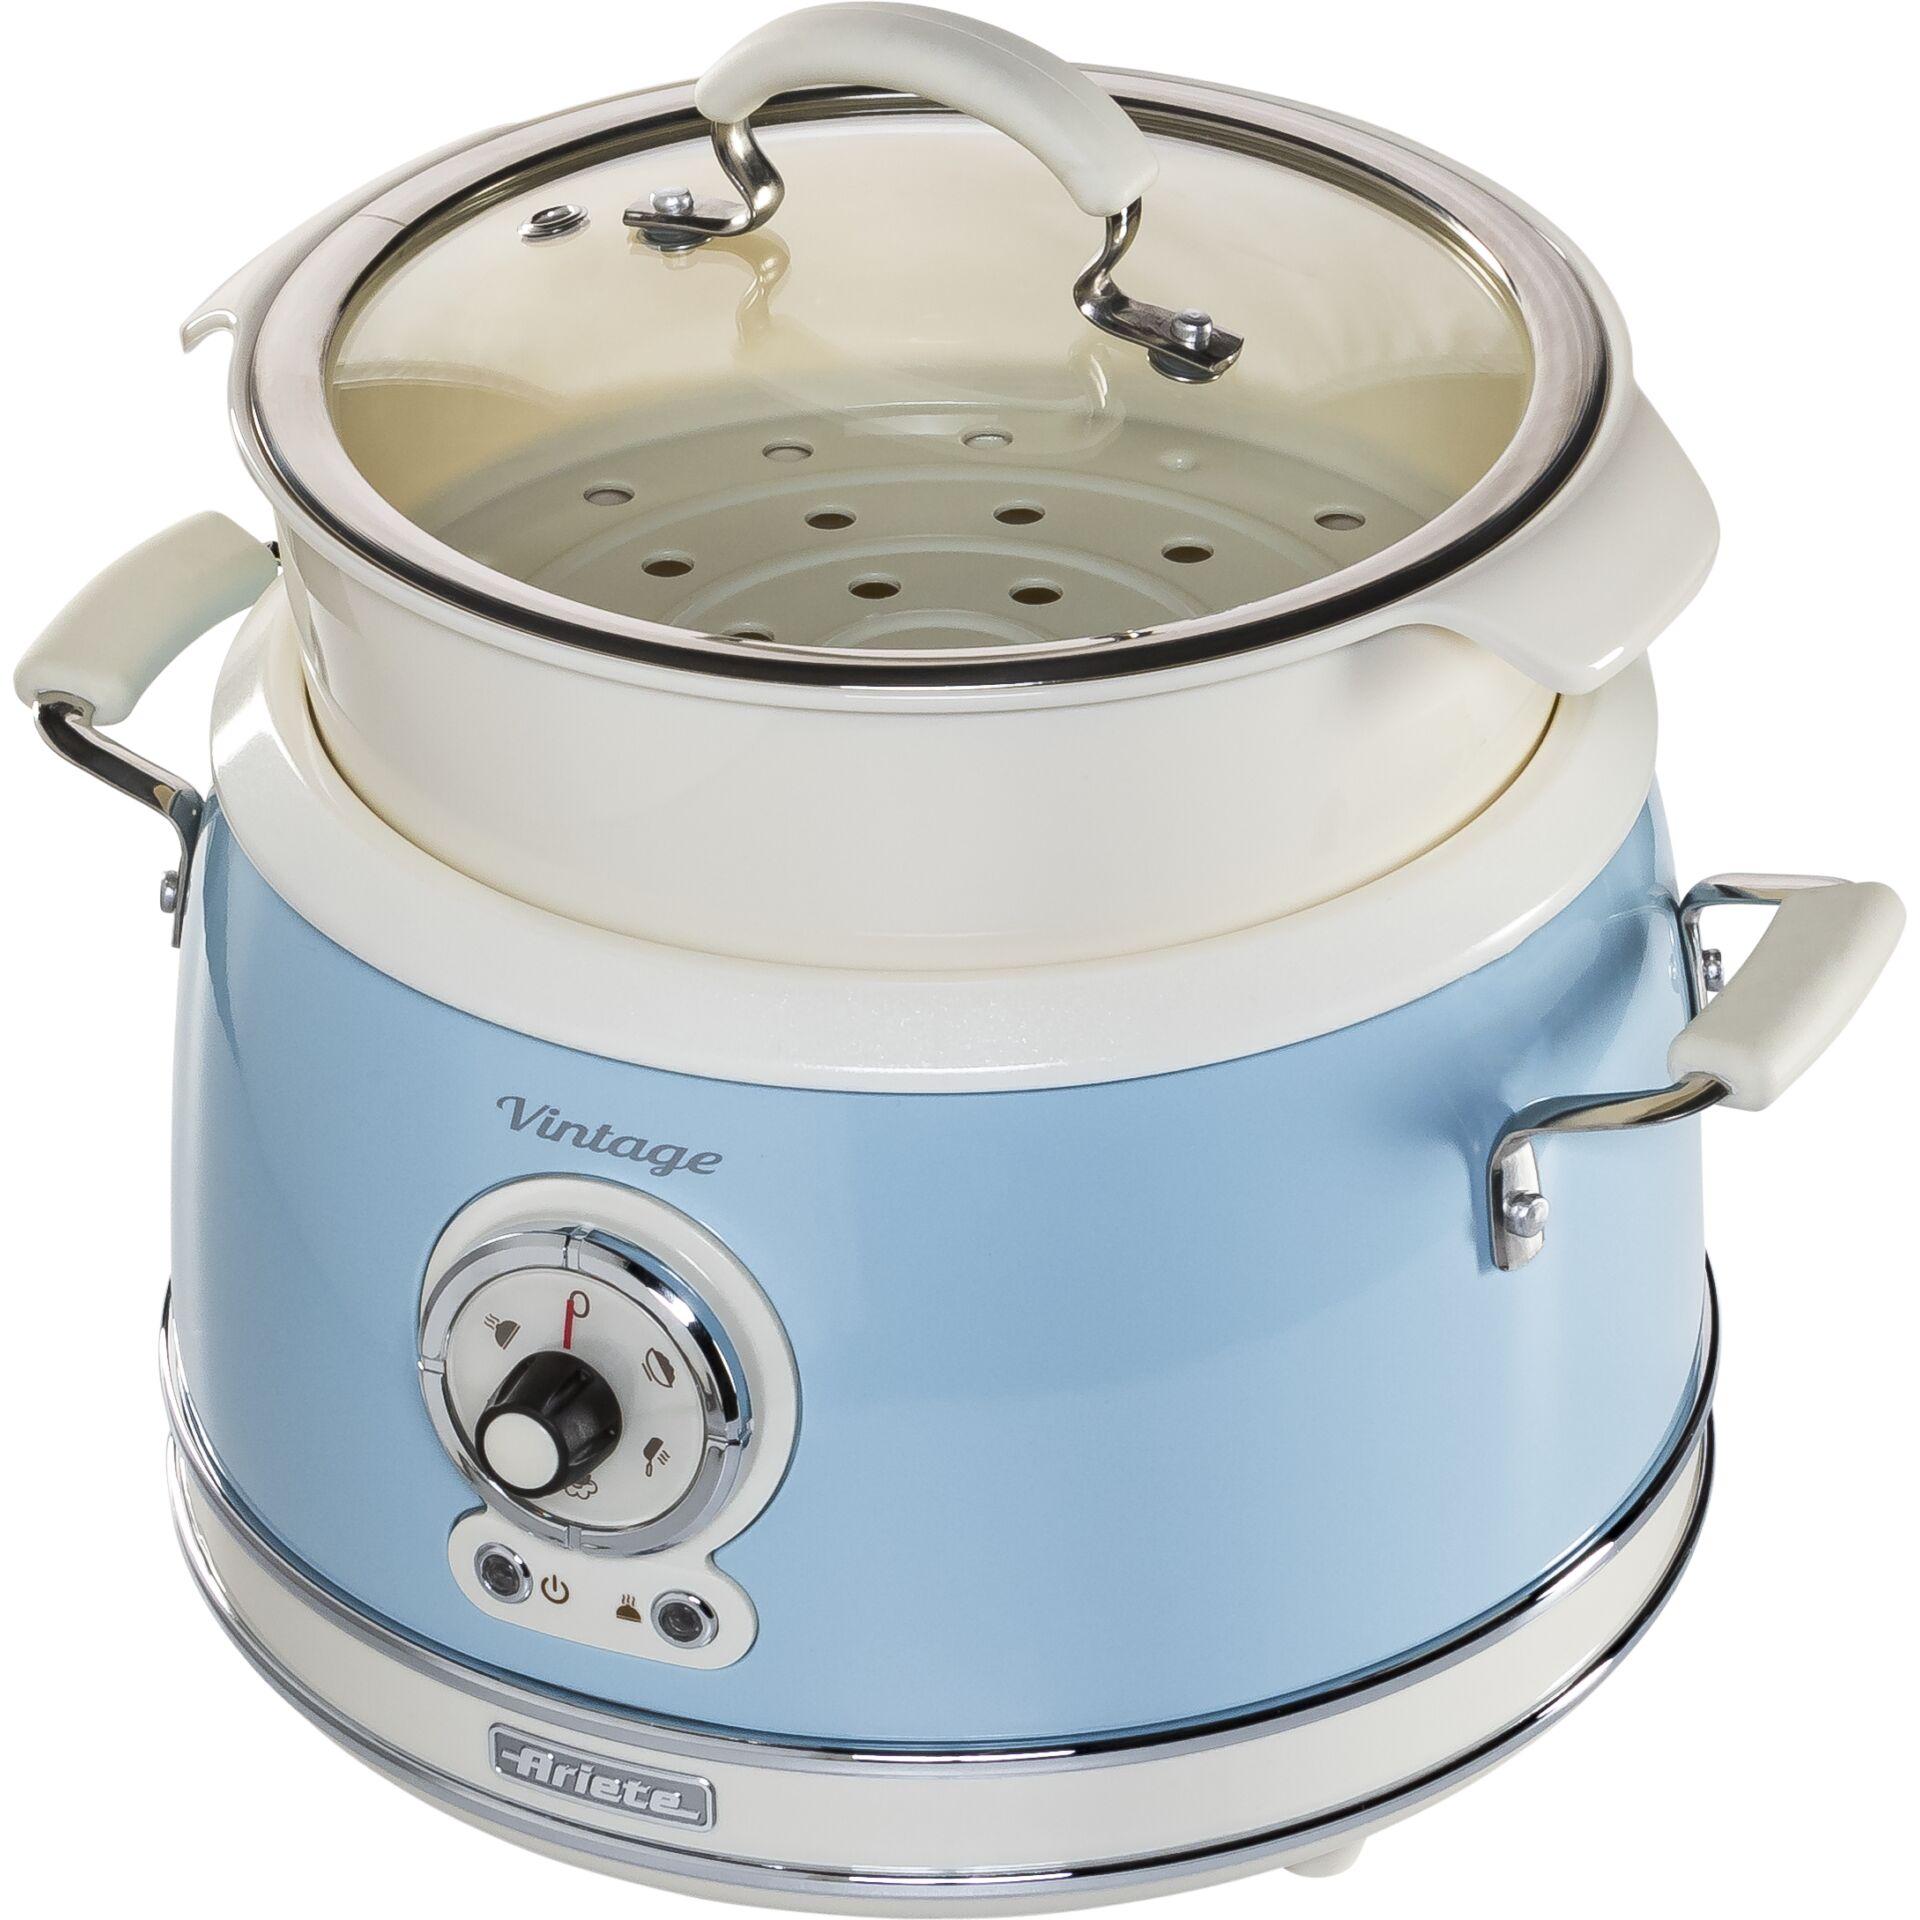 Ariete Vintage Dampfgarer, blau